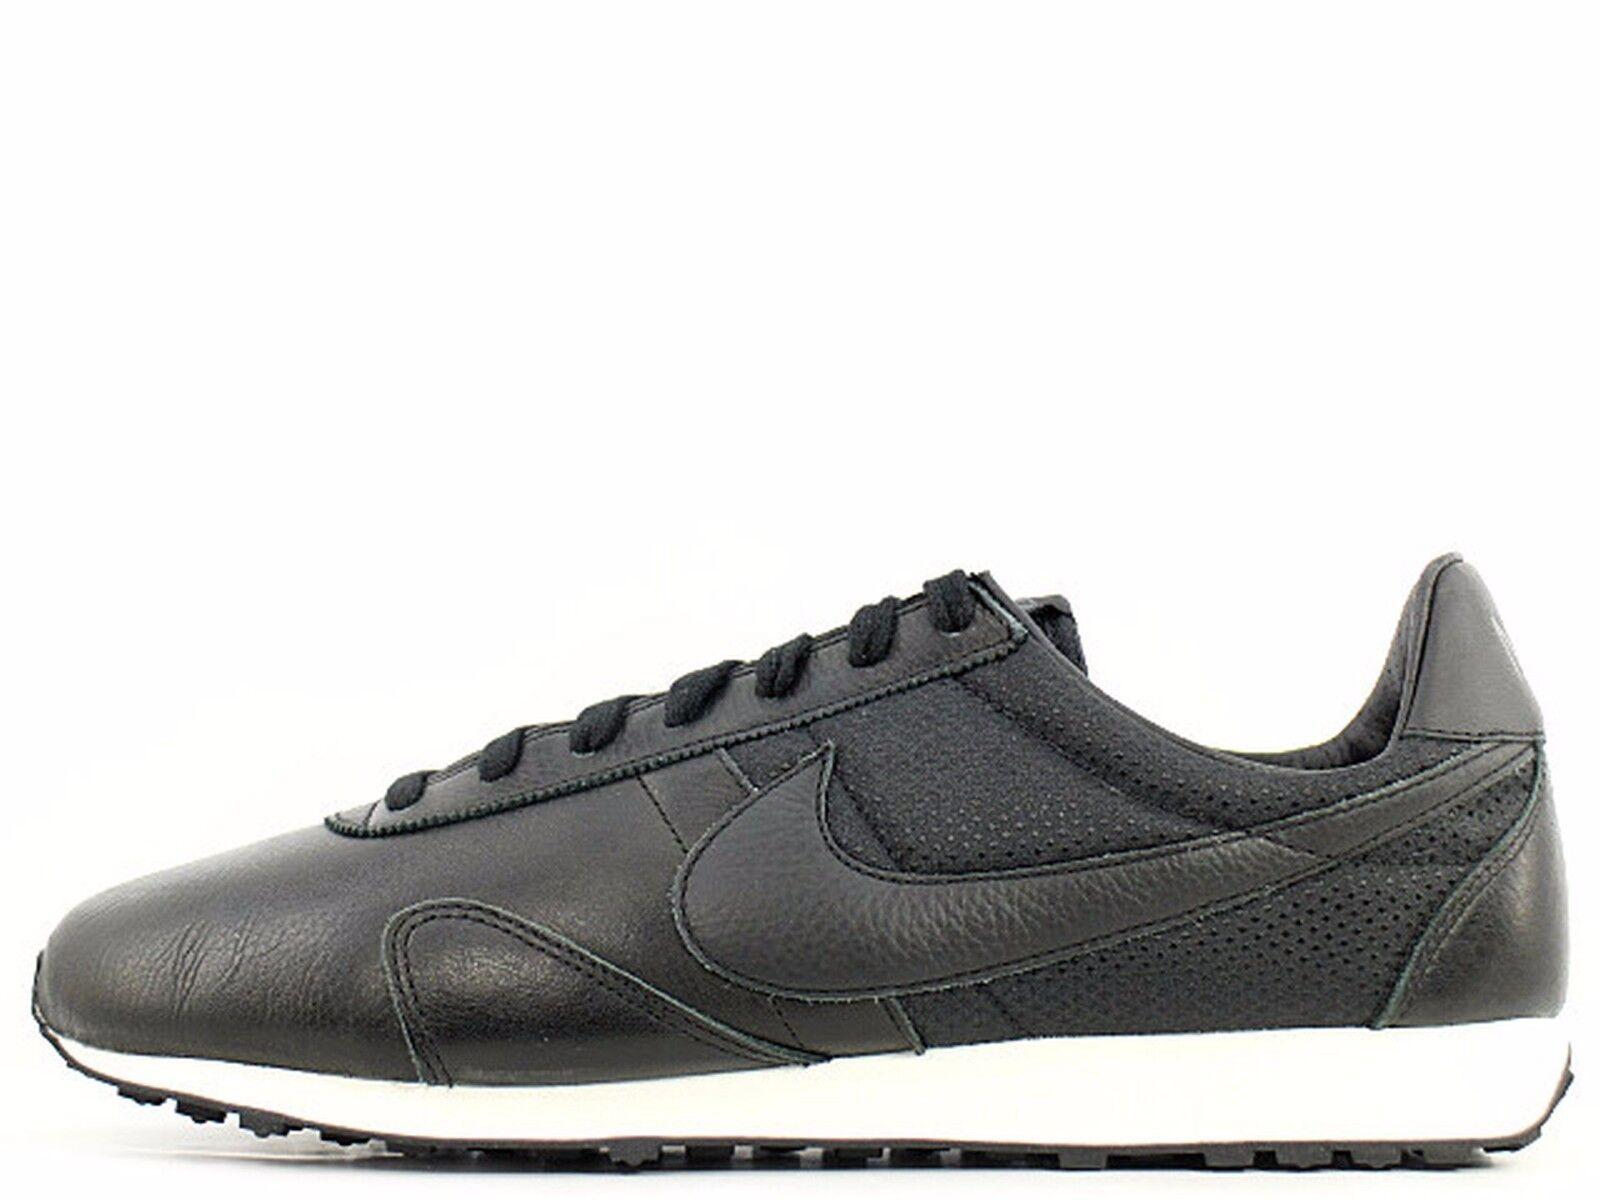 Nike Pre Montreal Racer Pinnacle Black Sail Wmn Sz 8.5 839605-003 Leather